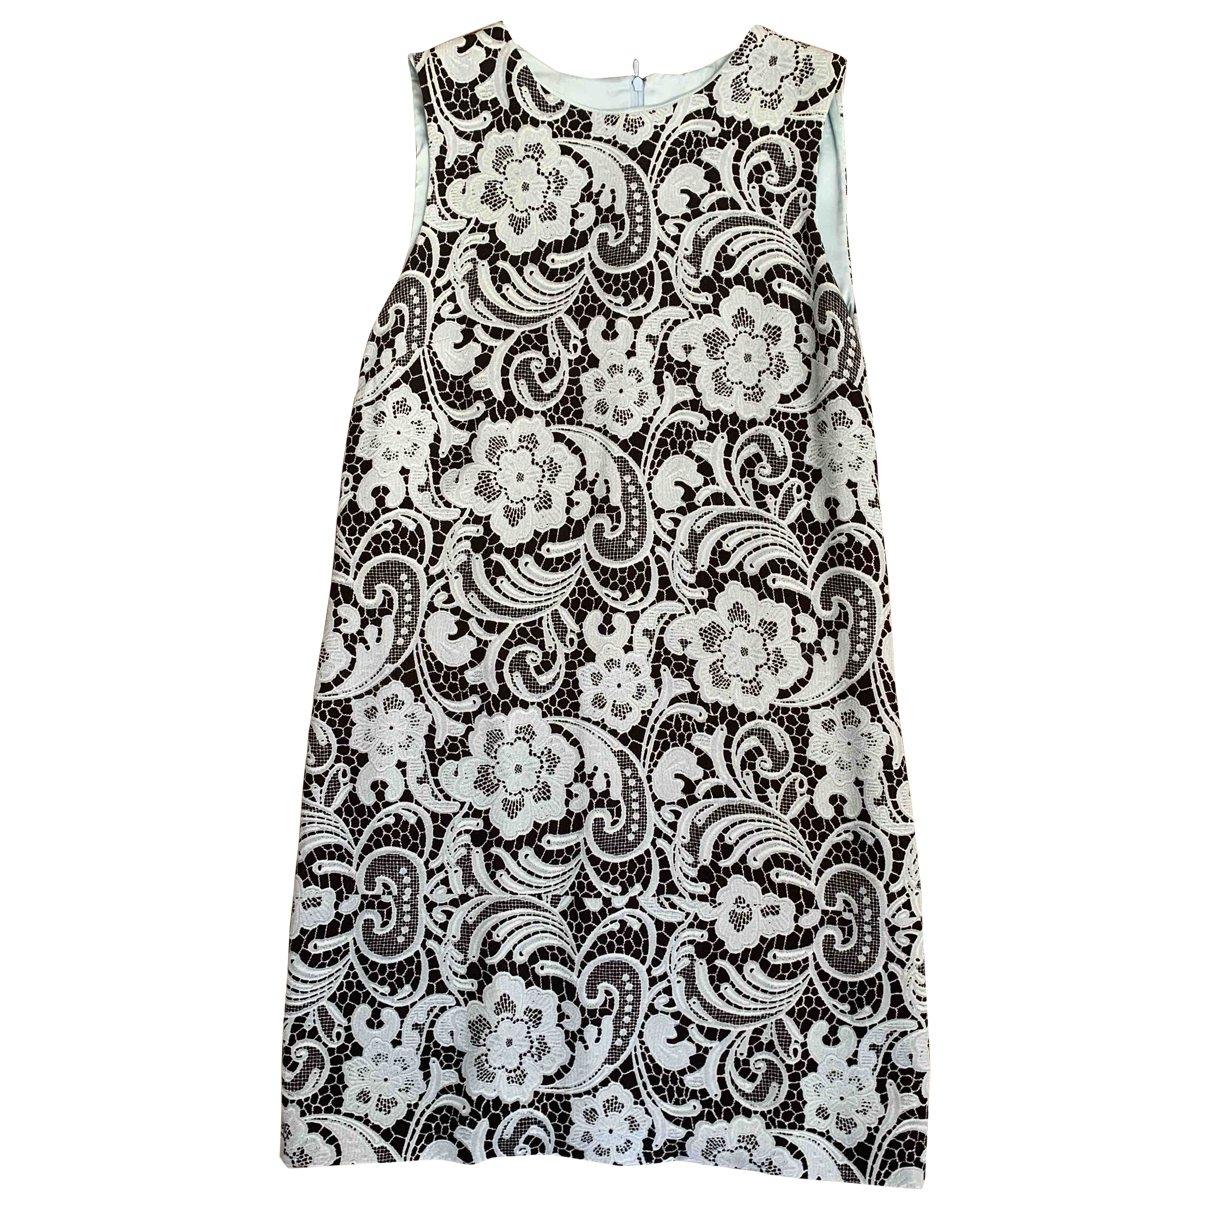 Dolce & Gabbana \N Kleid in  Blau Baumwolle